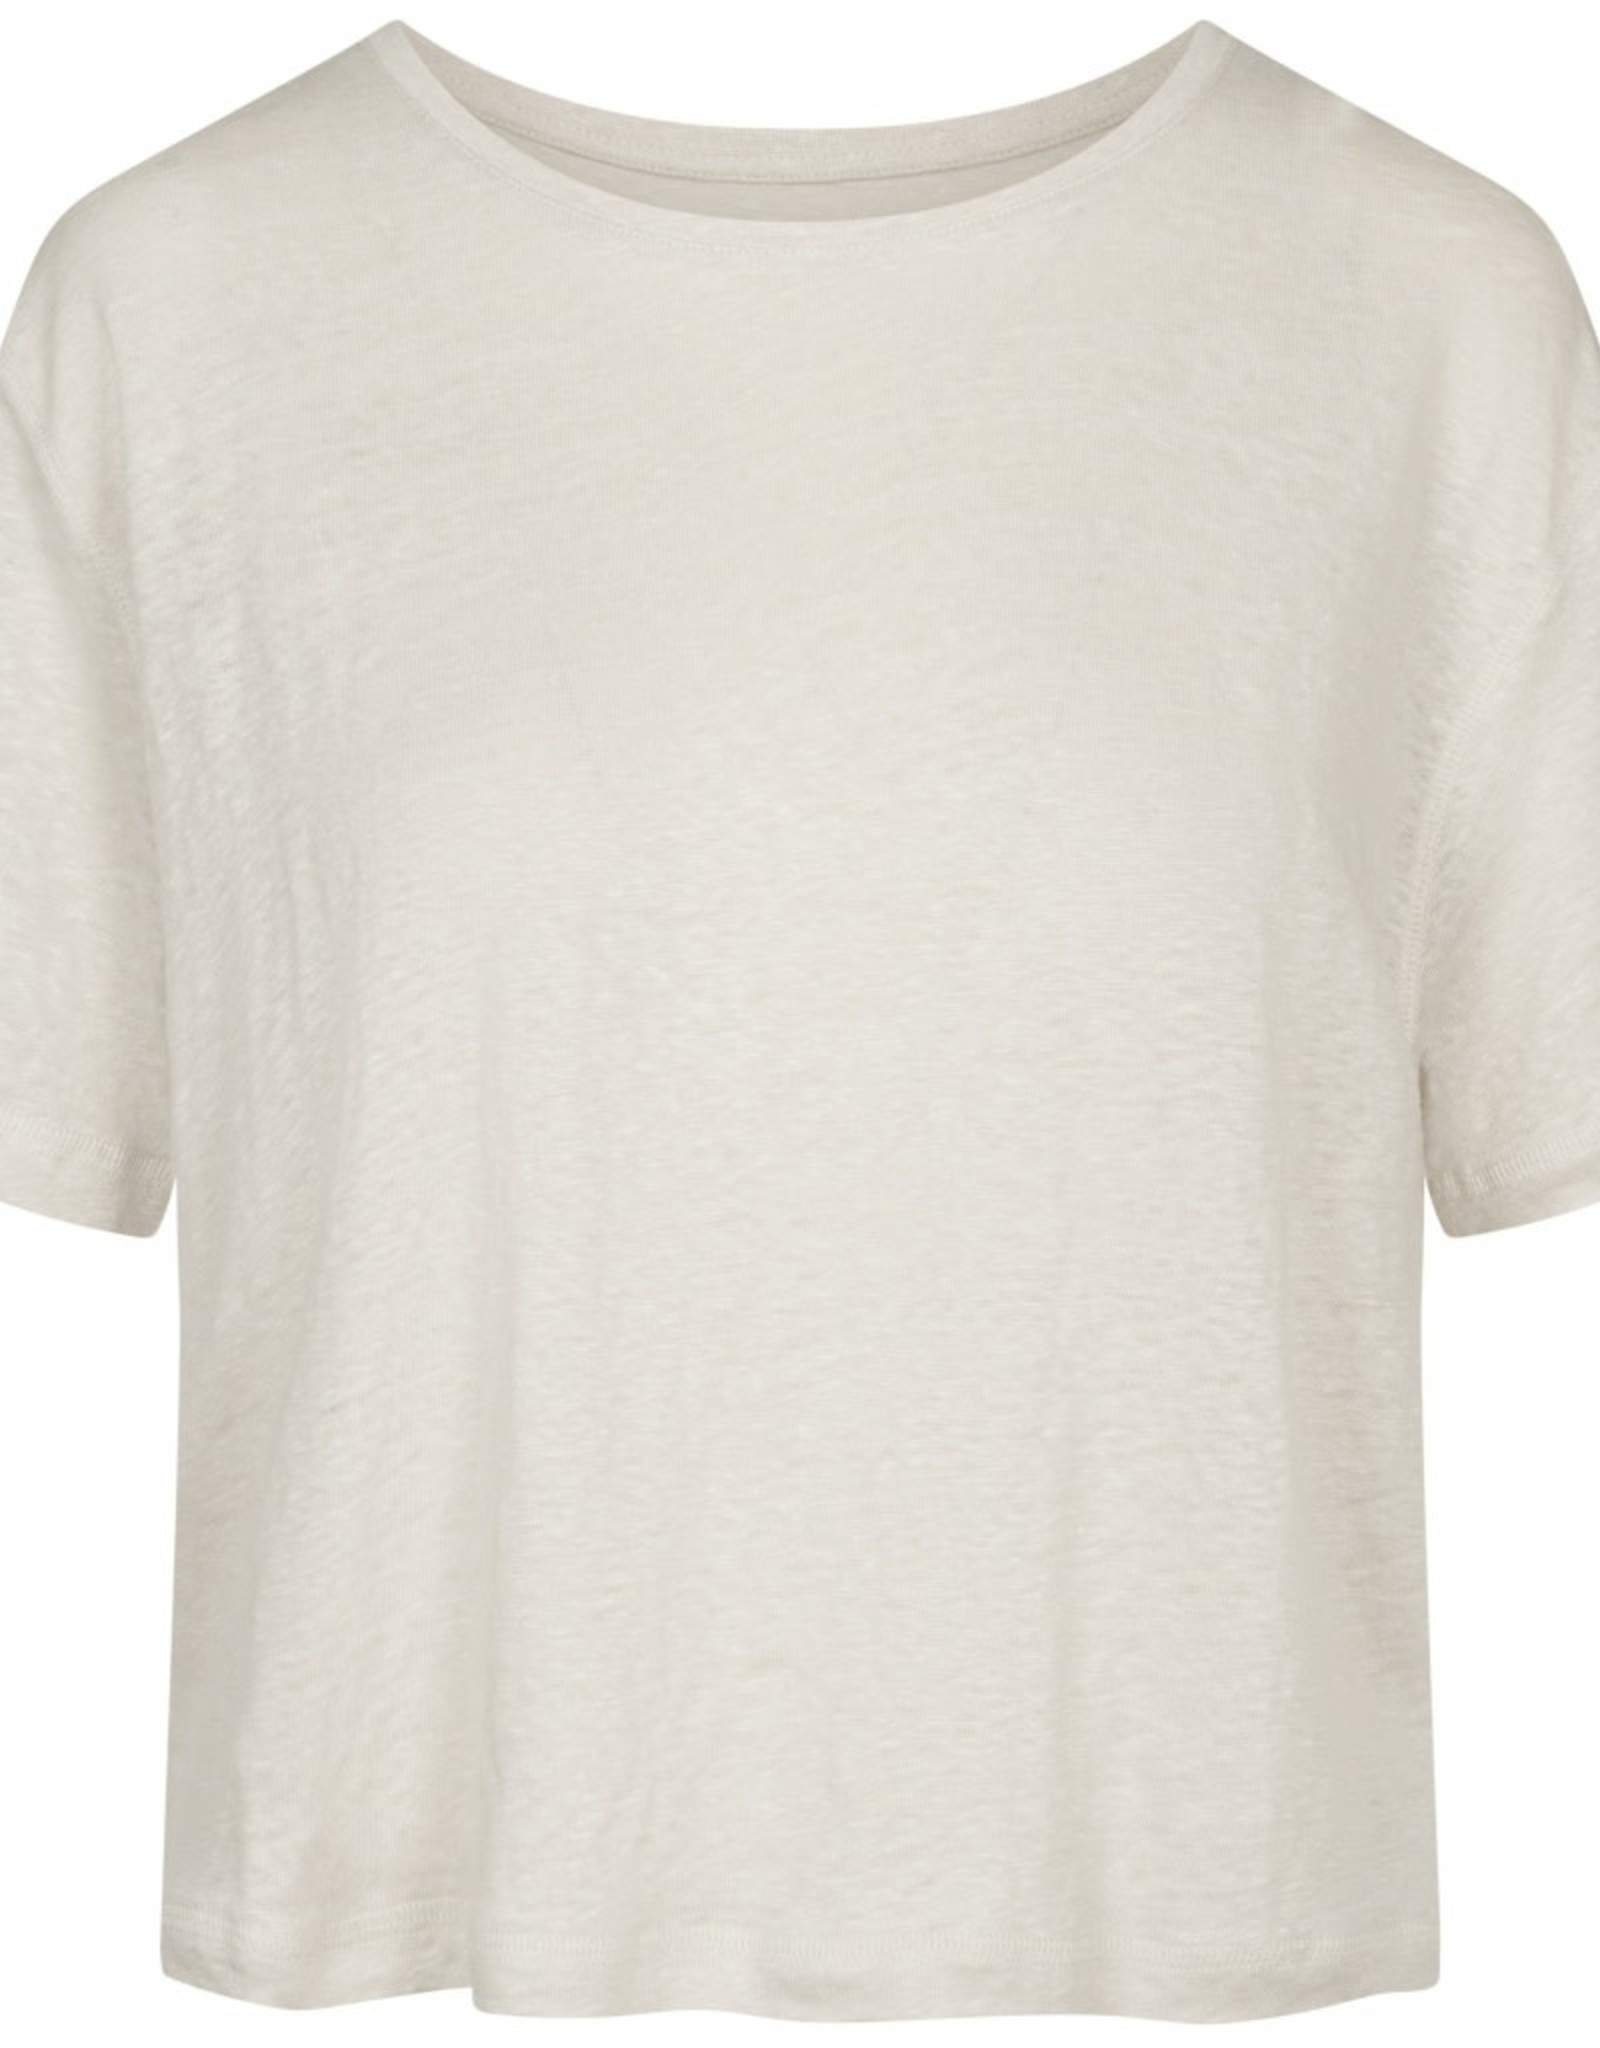 Gai&Lisva T-shirt 'Ivalo' linnen - Moonstruck